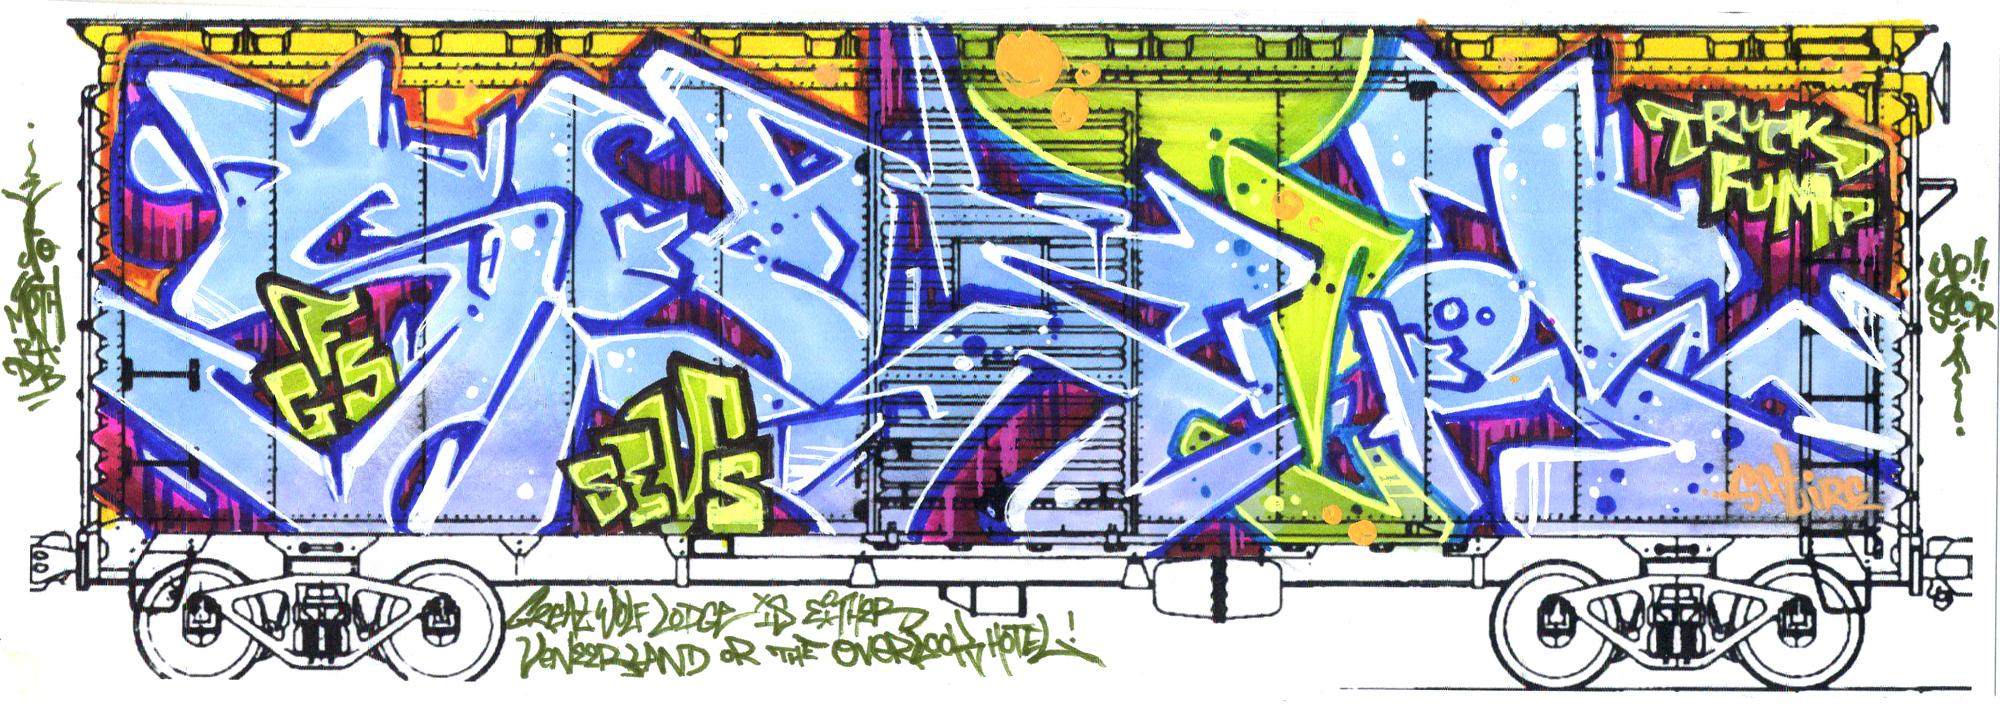 gwl boxcar.jpg